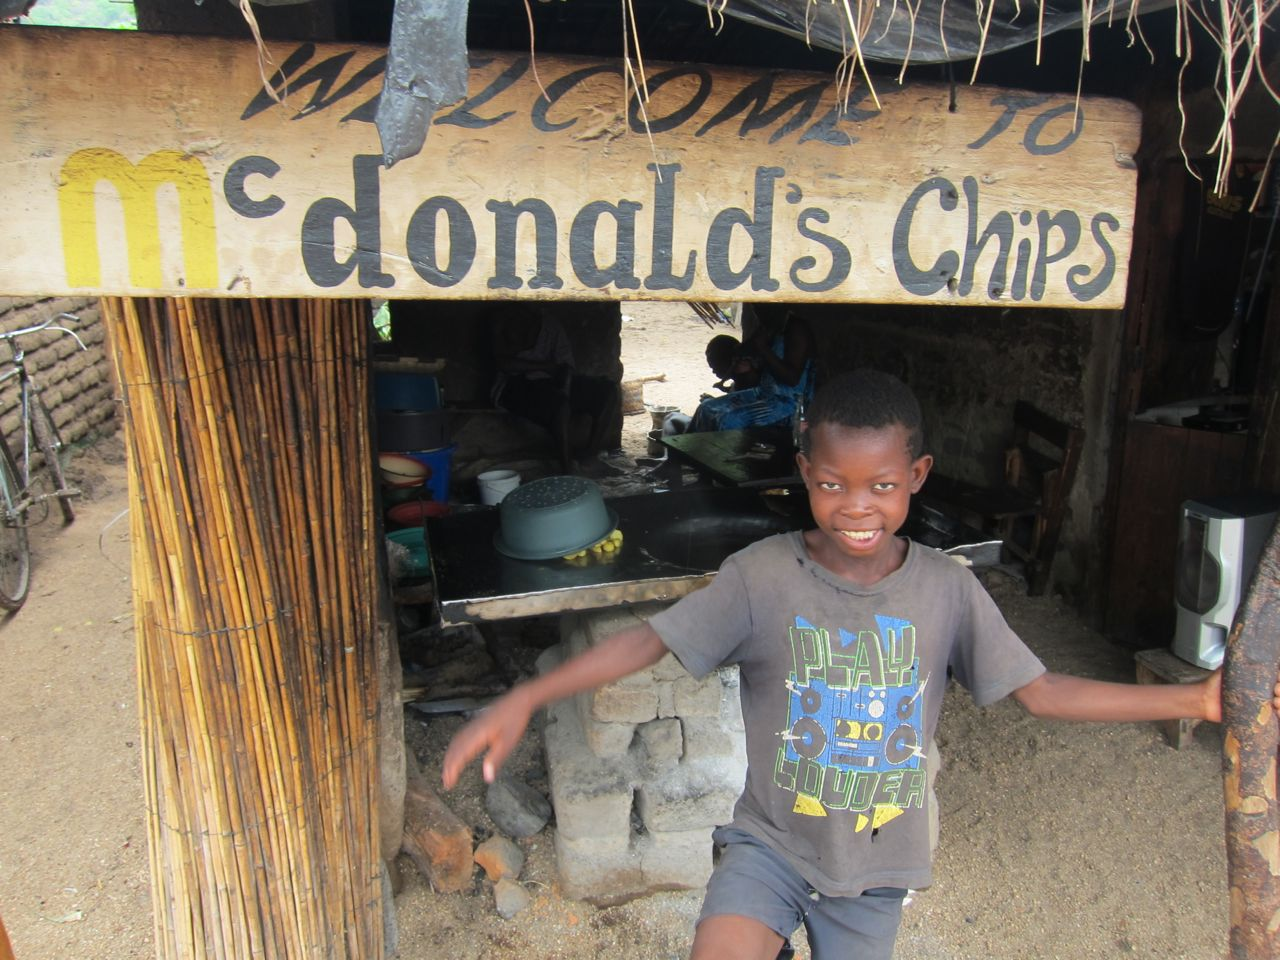 Mc Donald's Chips